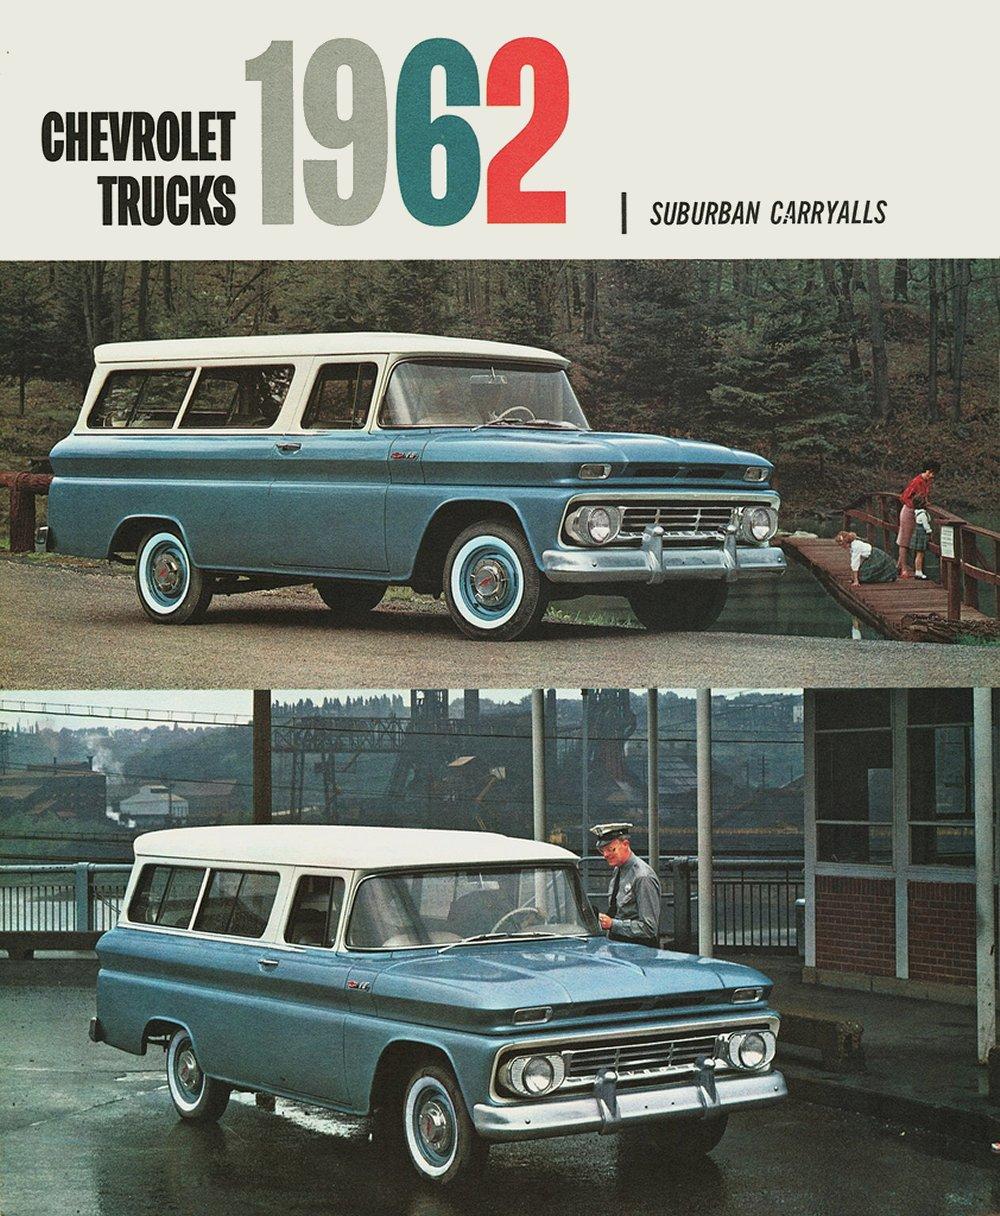 1962 chevrolet suburban carryall